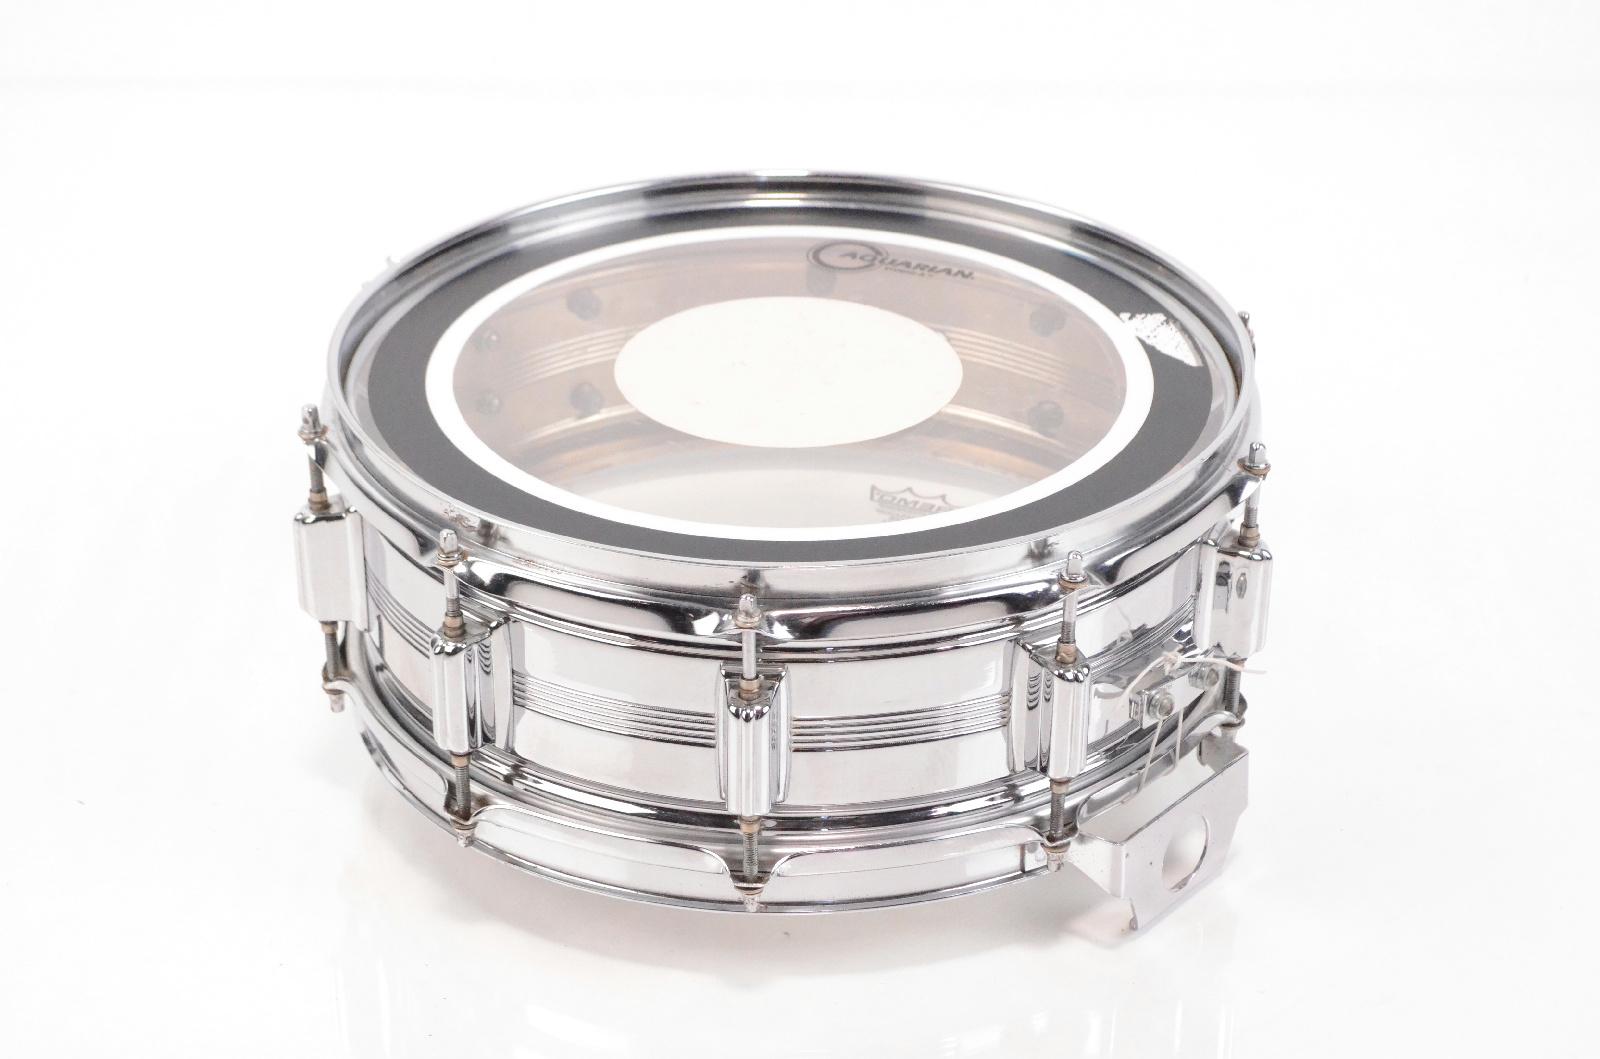 "Rogers DynaSonic 14' x 5"" Snare Drum ""Big R"" Badge Ray Luzier Korn #33001"